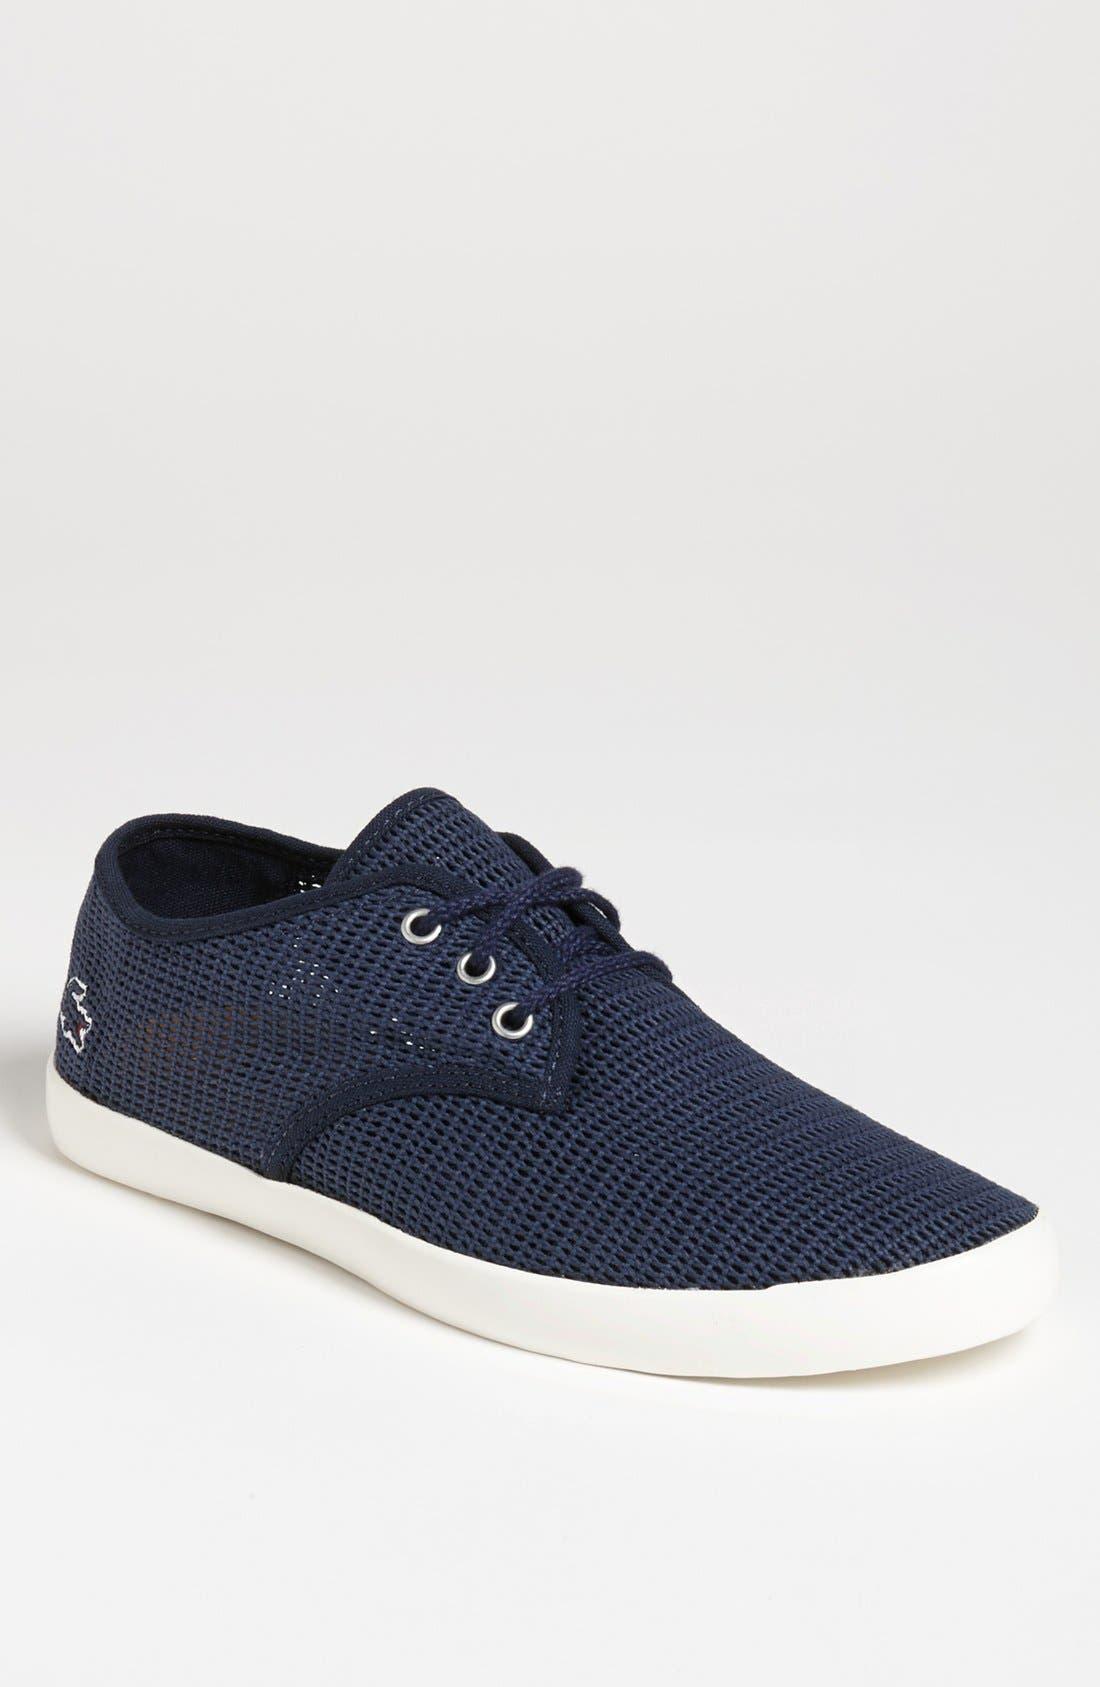 Alternate Image 1 Selected - Lacoste 'Aristide 10' Sneaker (Men)